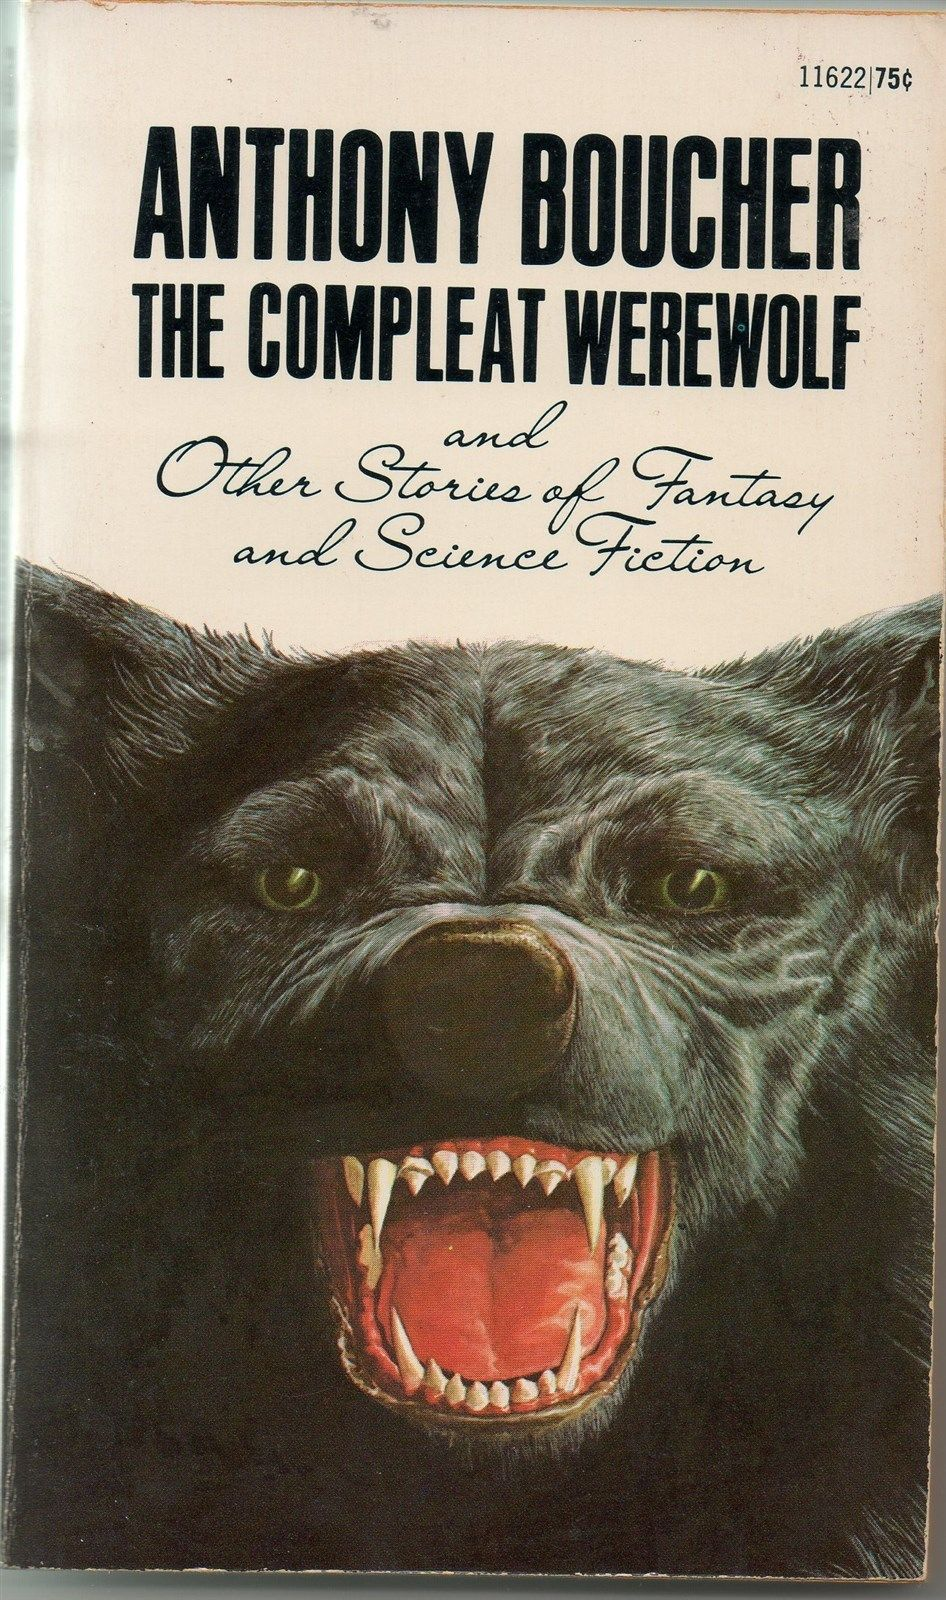 The compleat werewolf - Lande Incantate